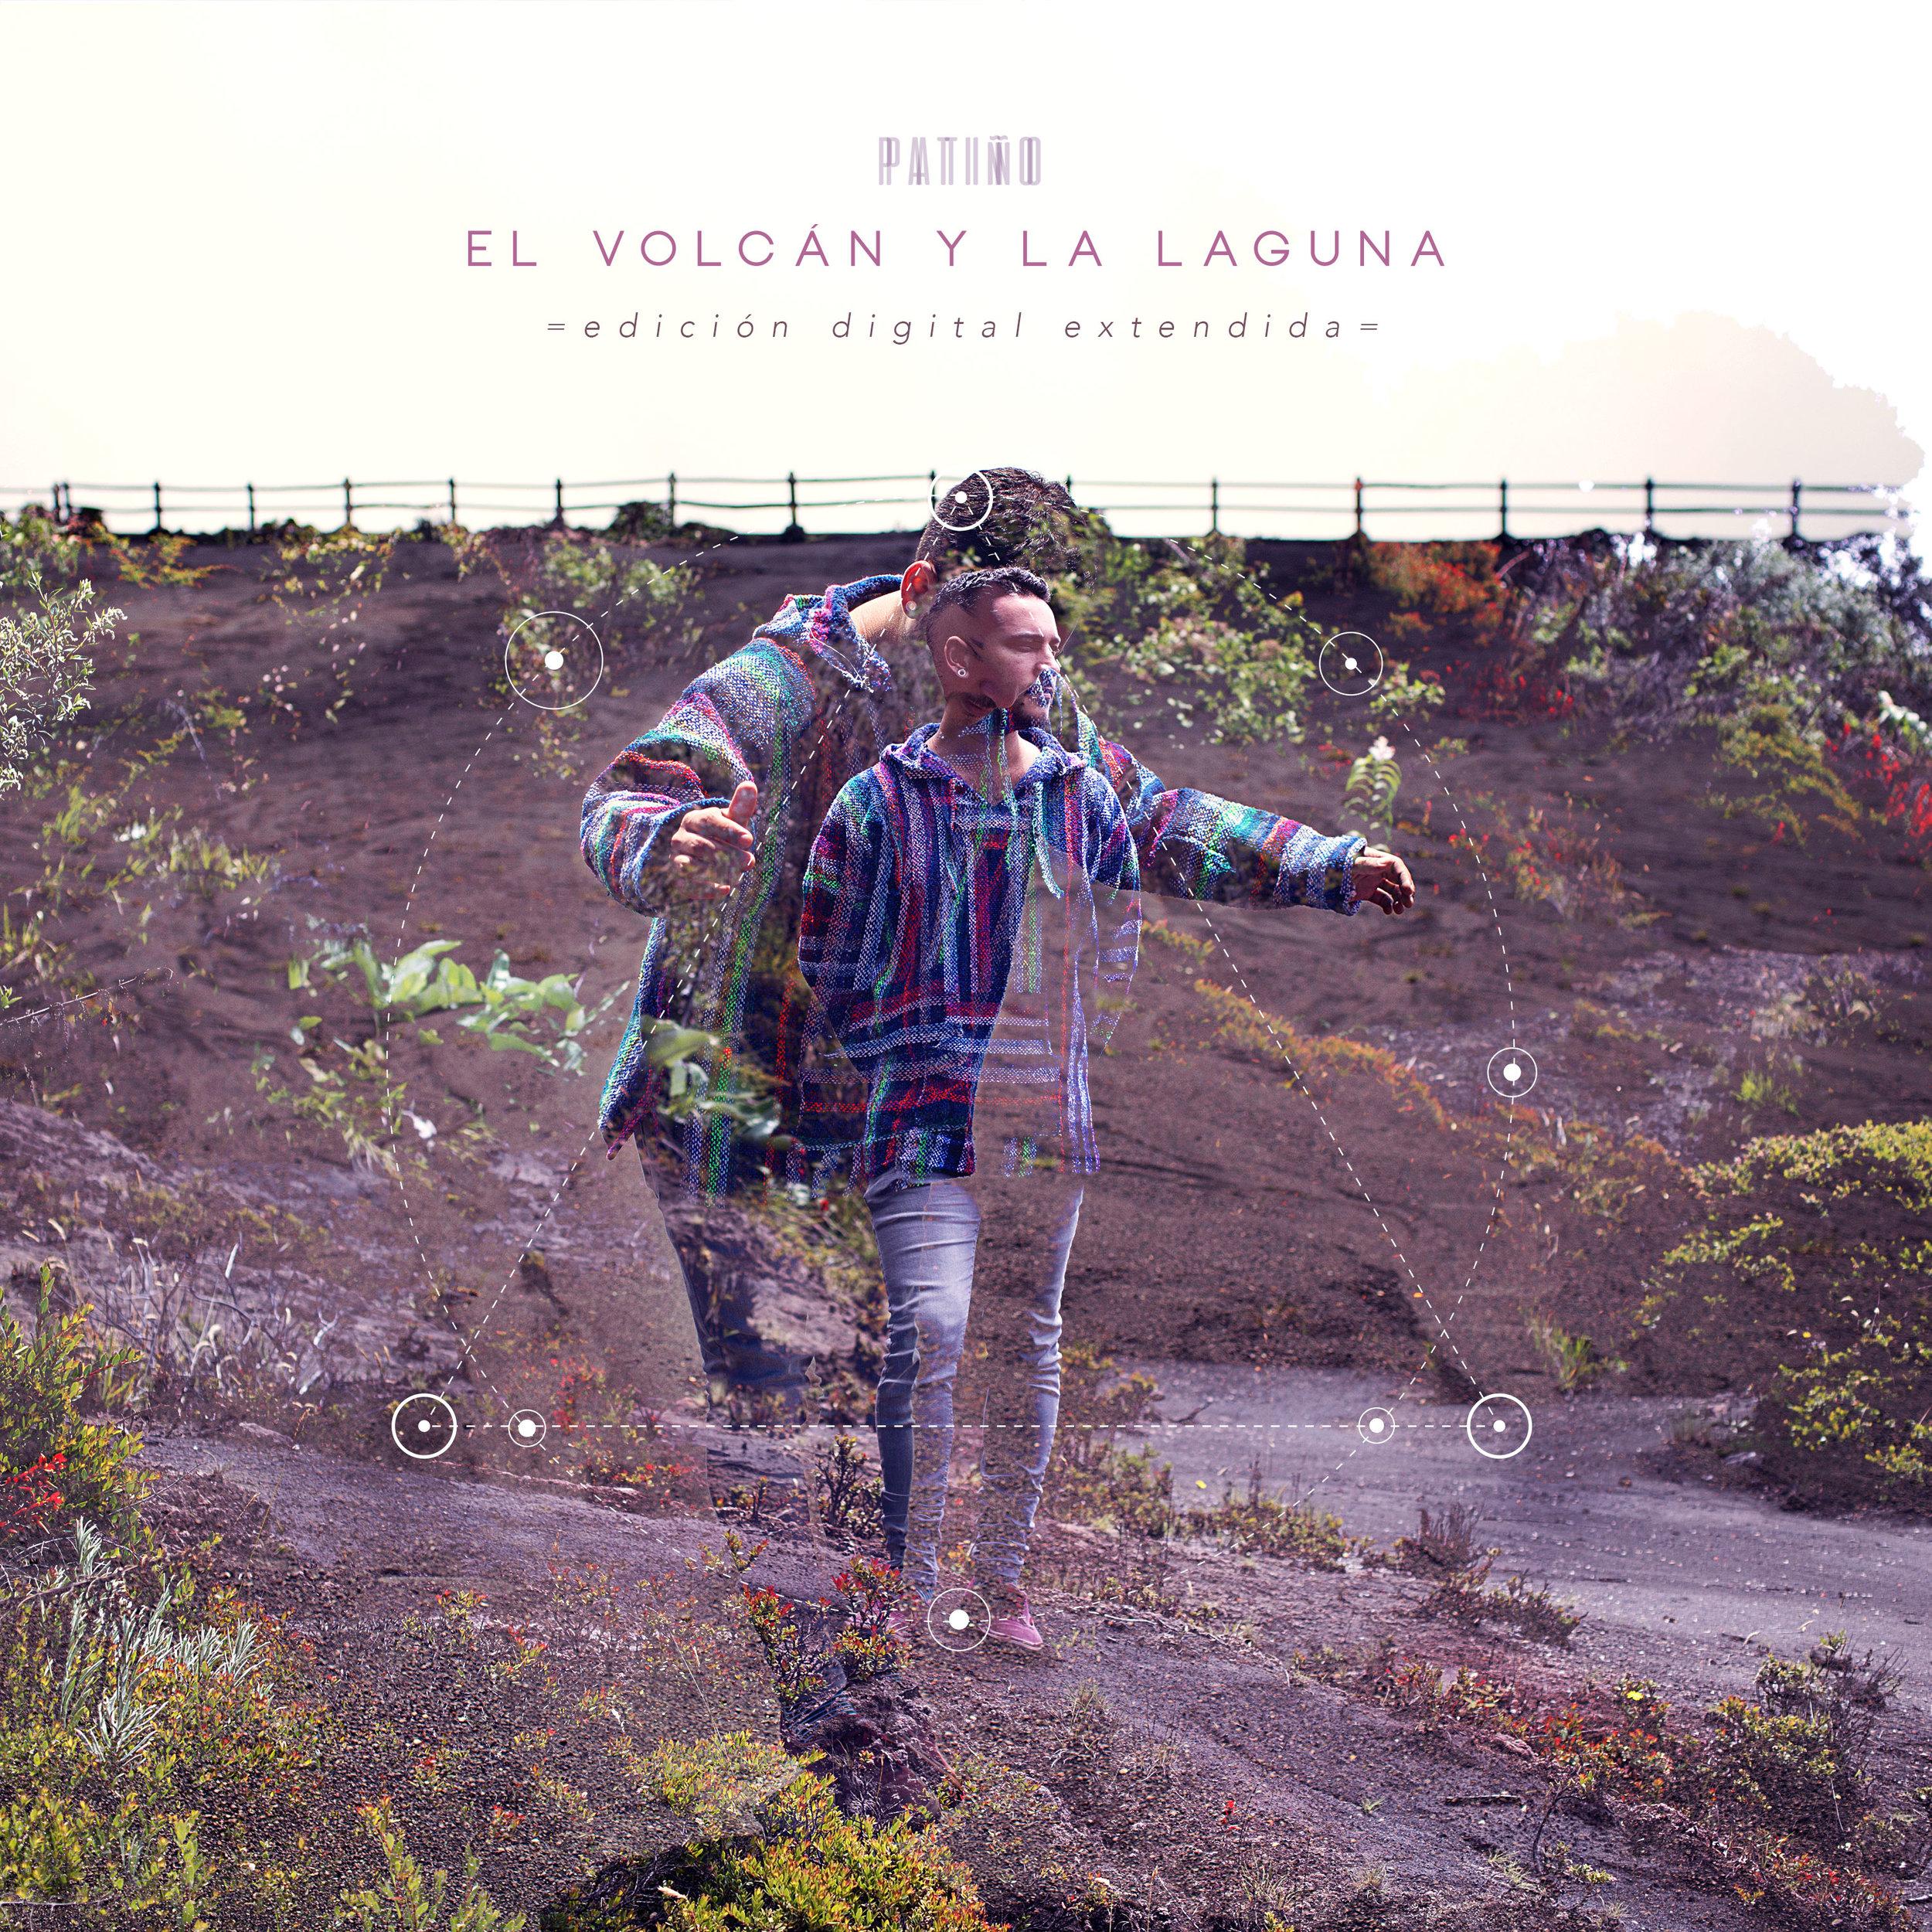 ElVolcanylaLaguna-portada.jpg